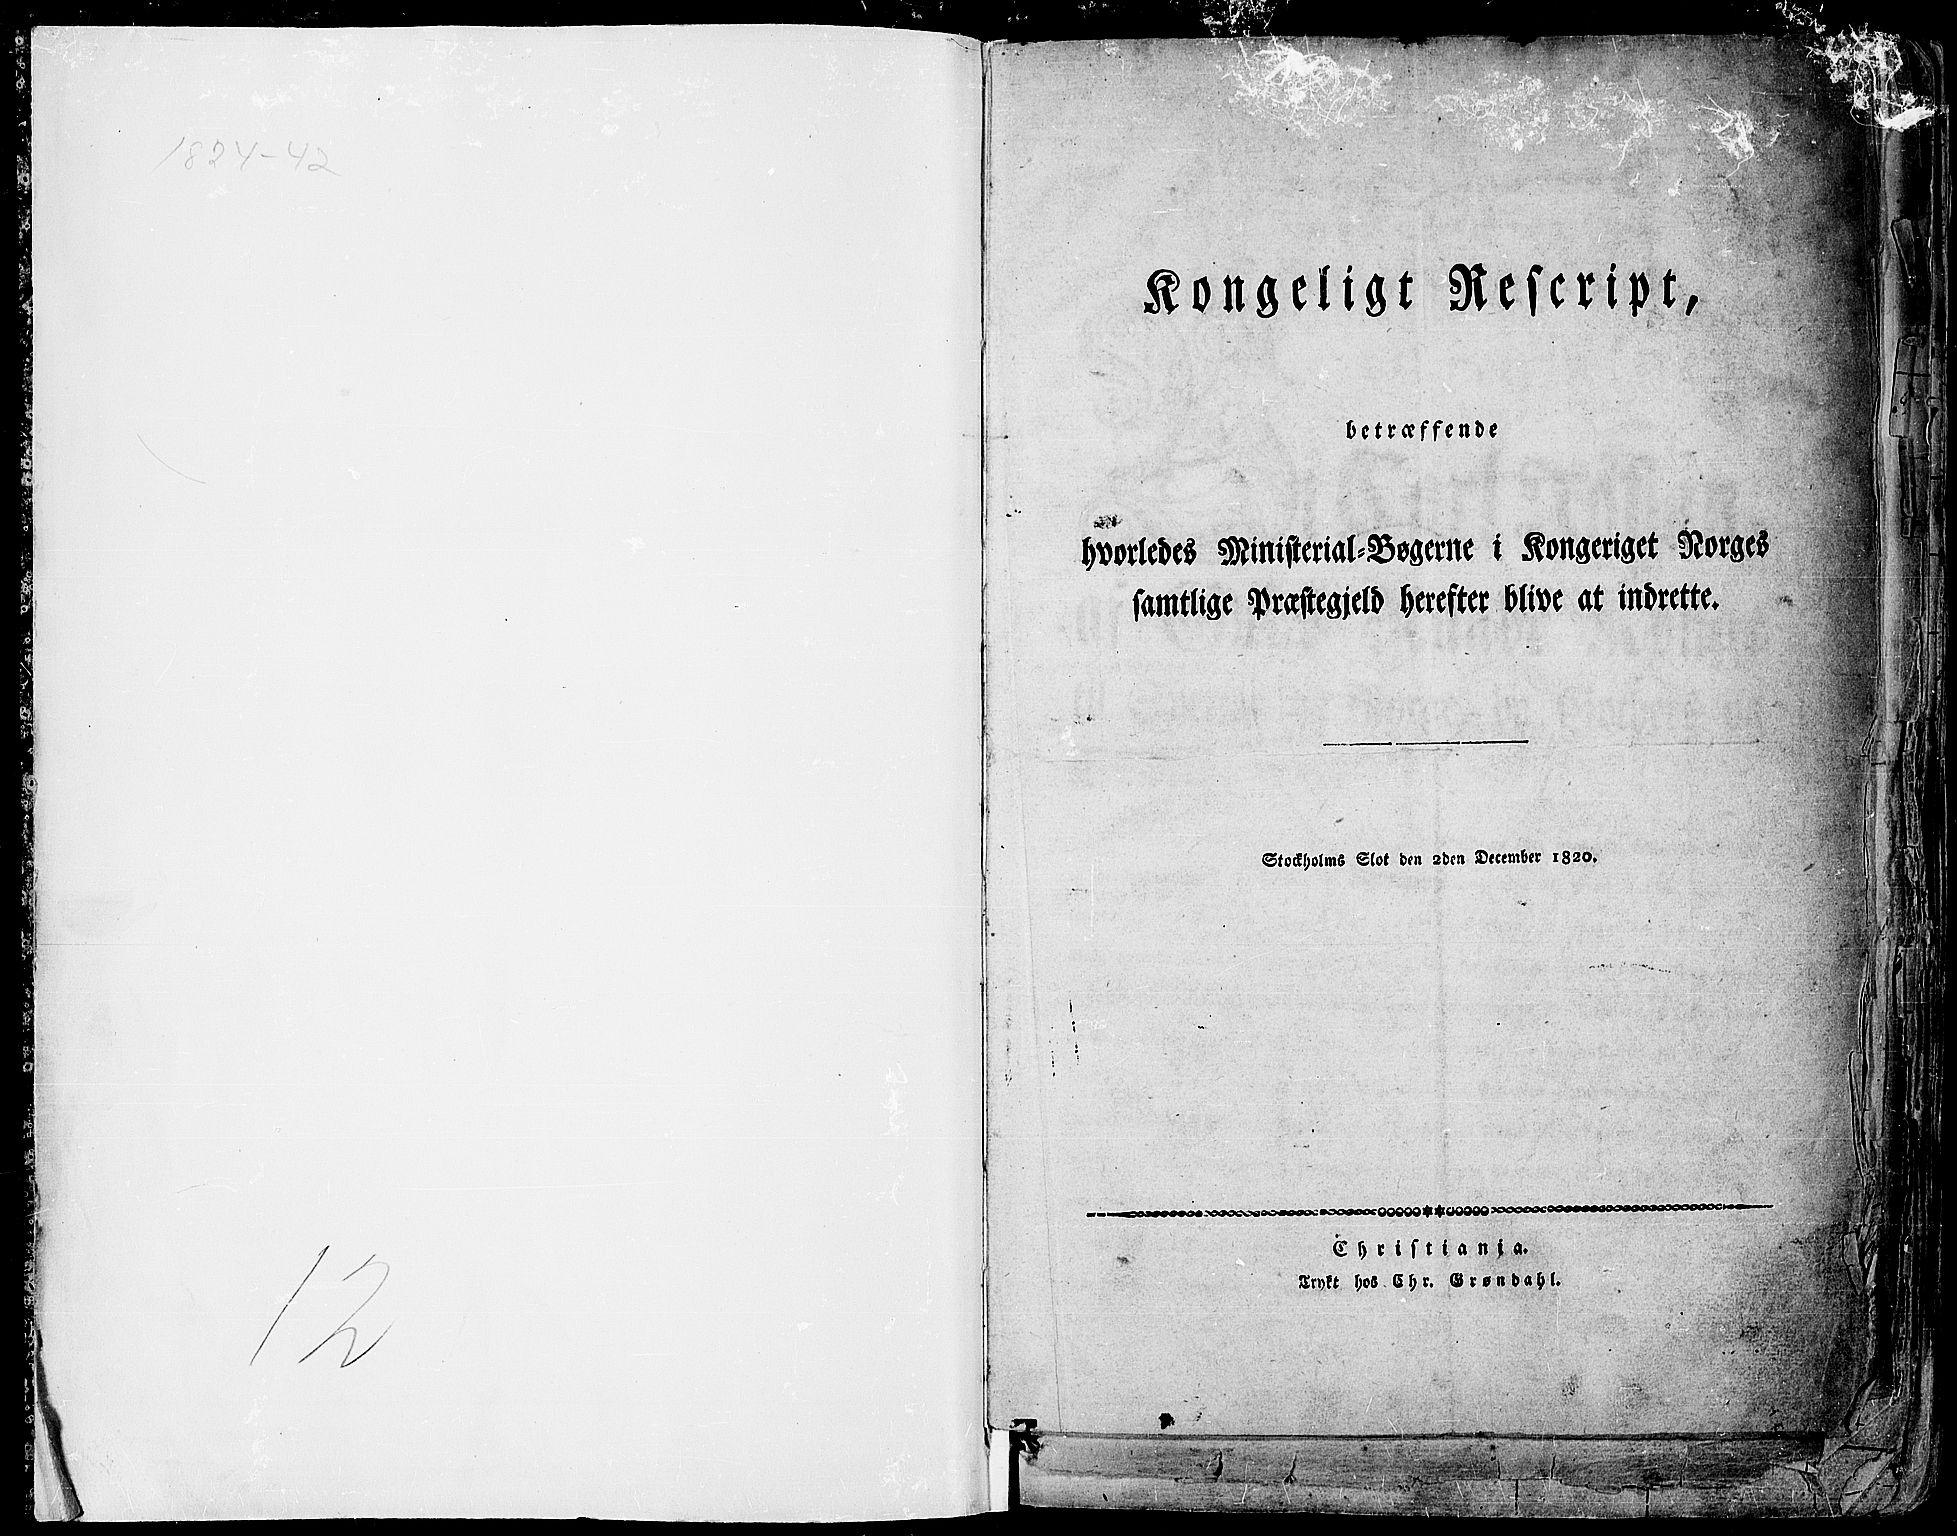 SAH, Gran prestekontor, Ministerialbok nr. 10, 1824-1842